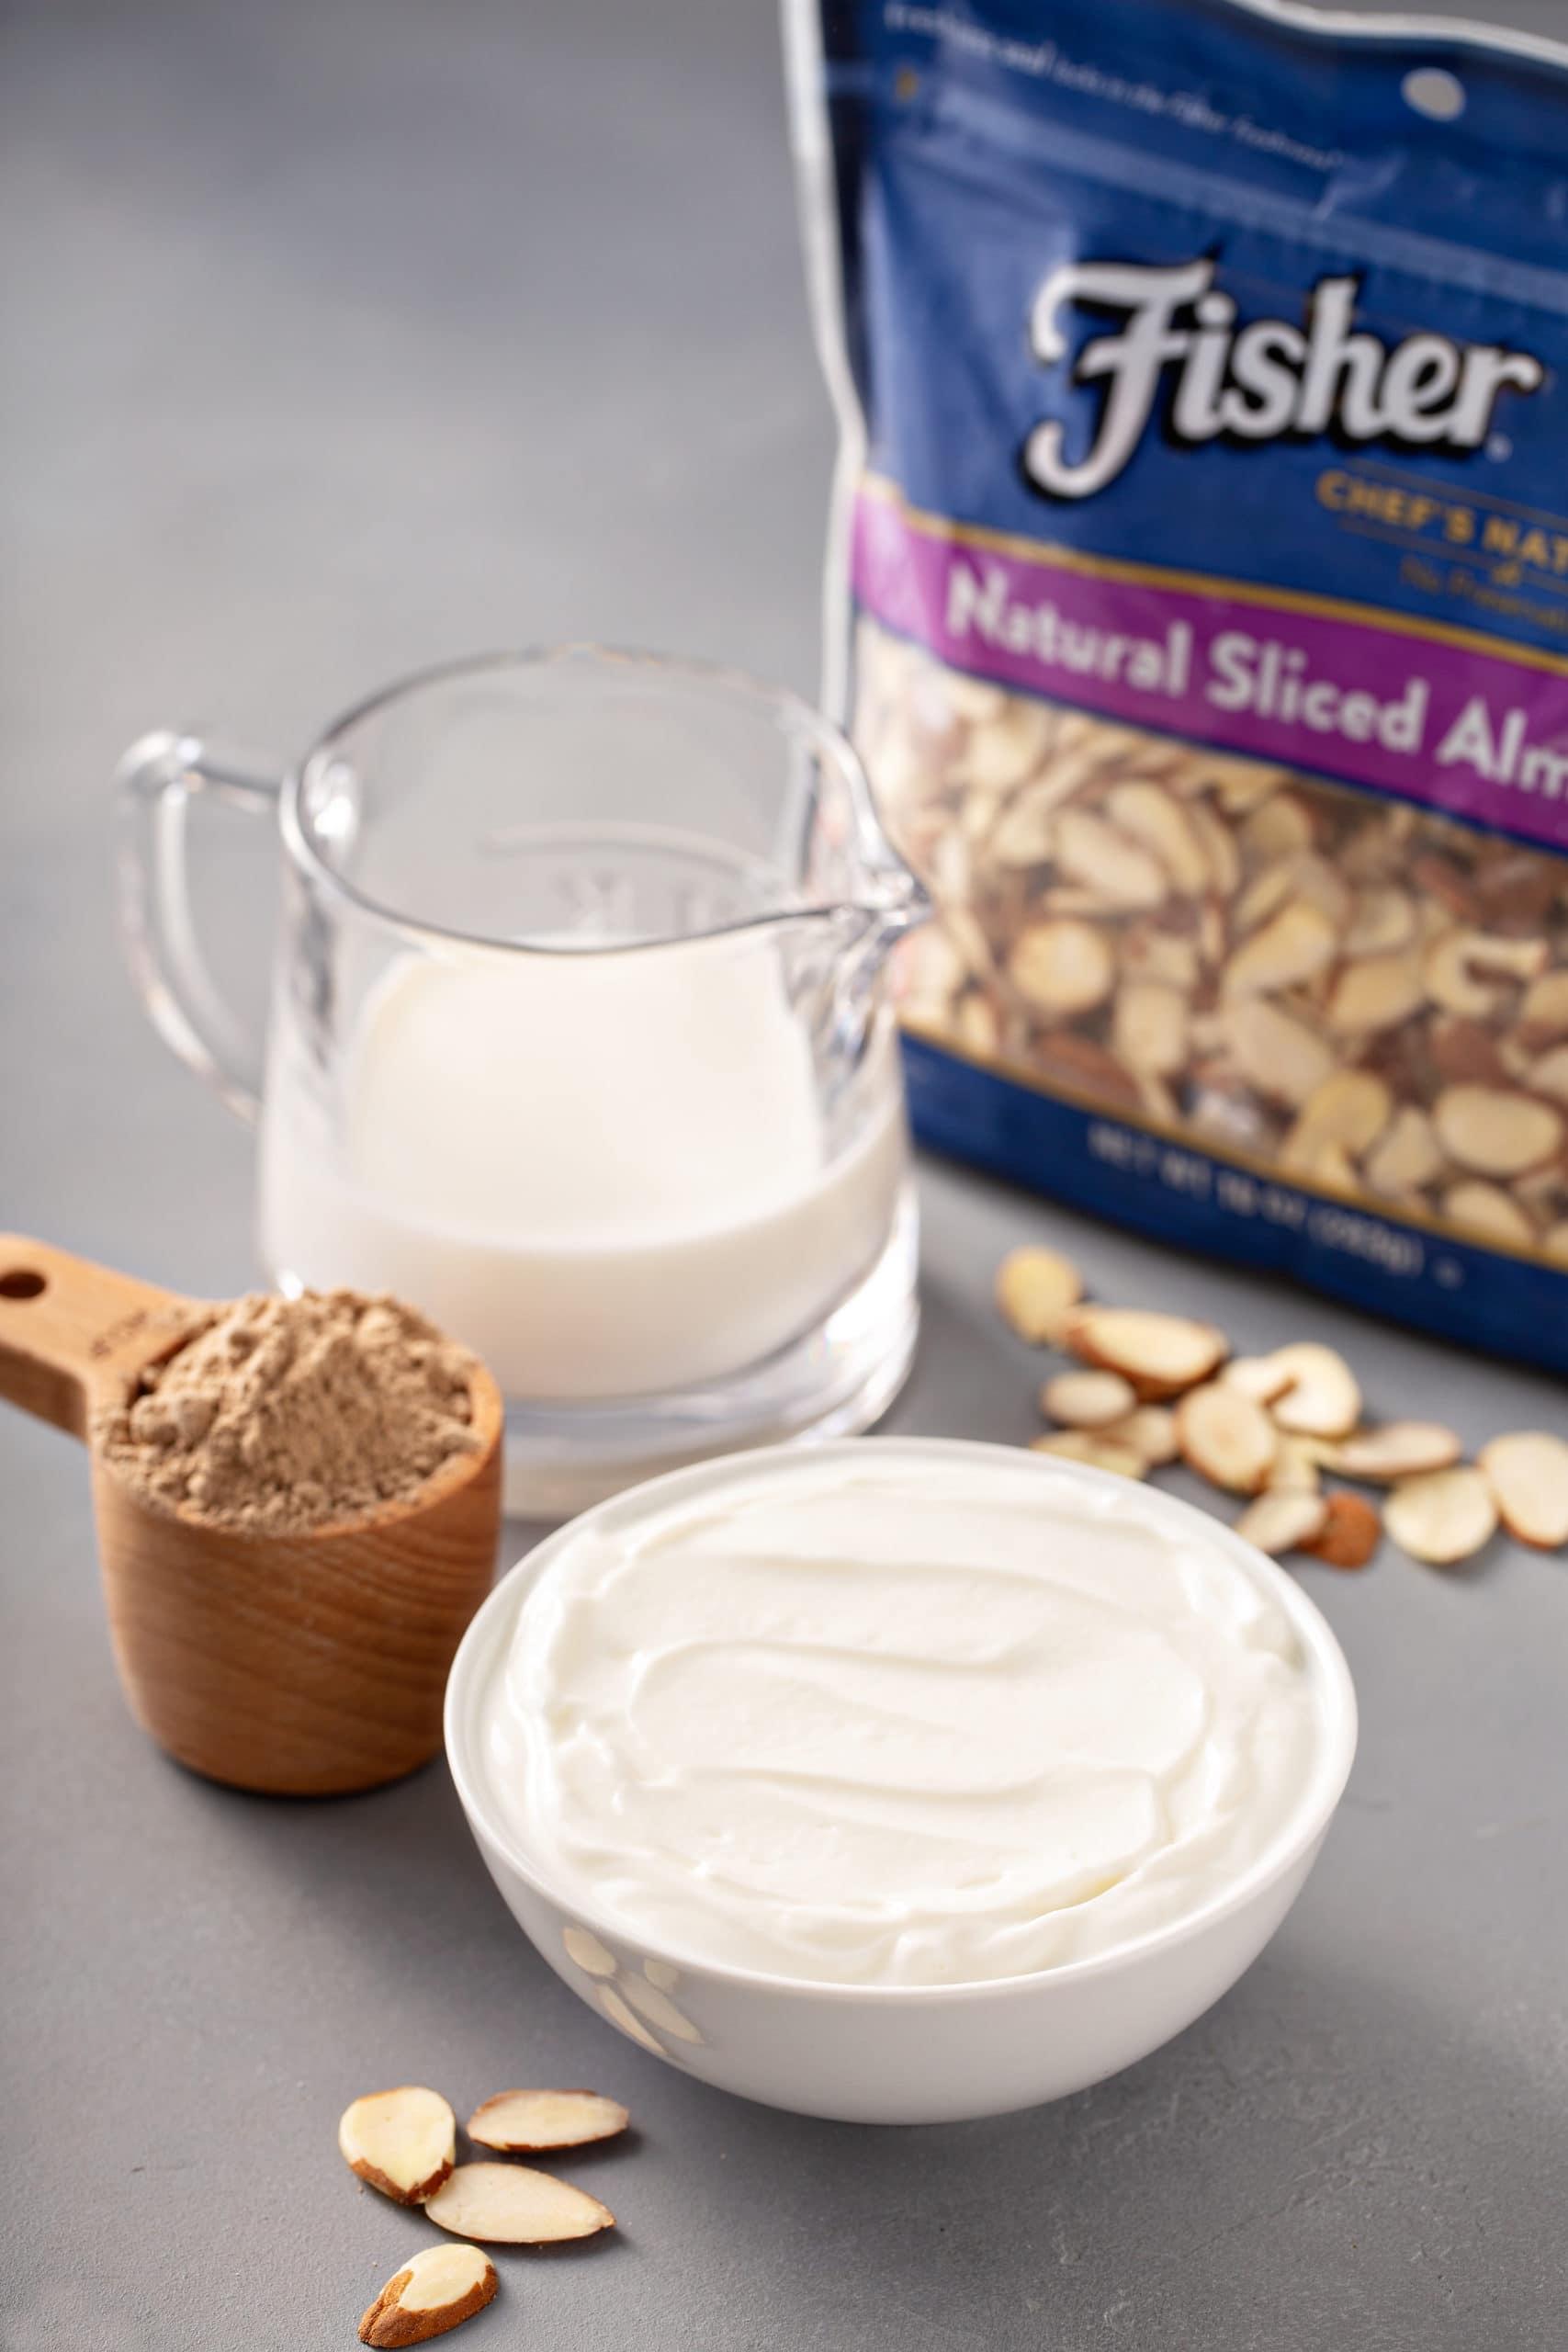 ingredients to make an almond joy protein shake like yogurt, milk, chocolate protein, almonds